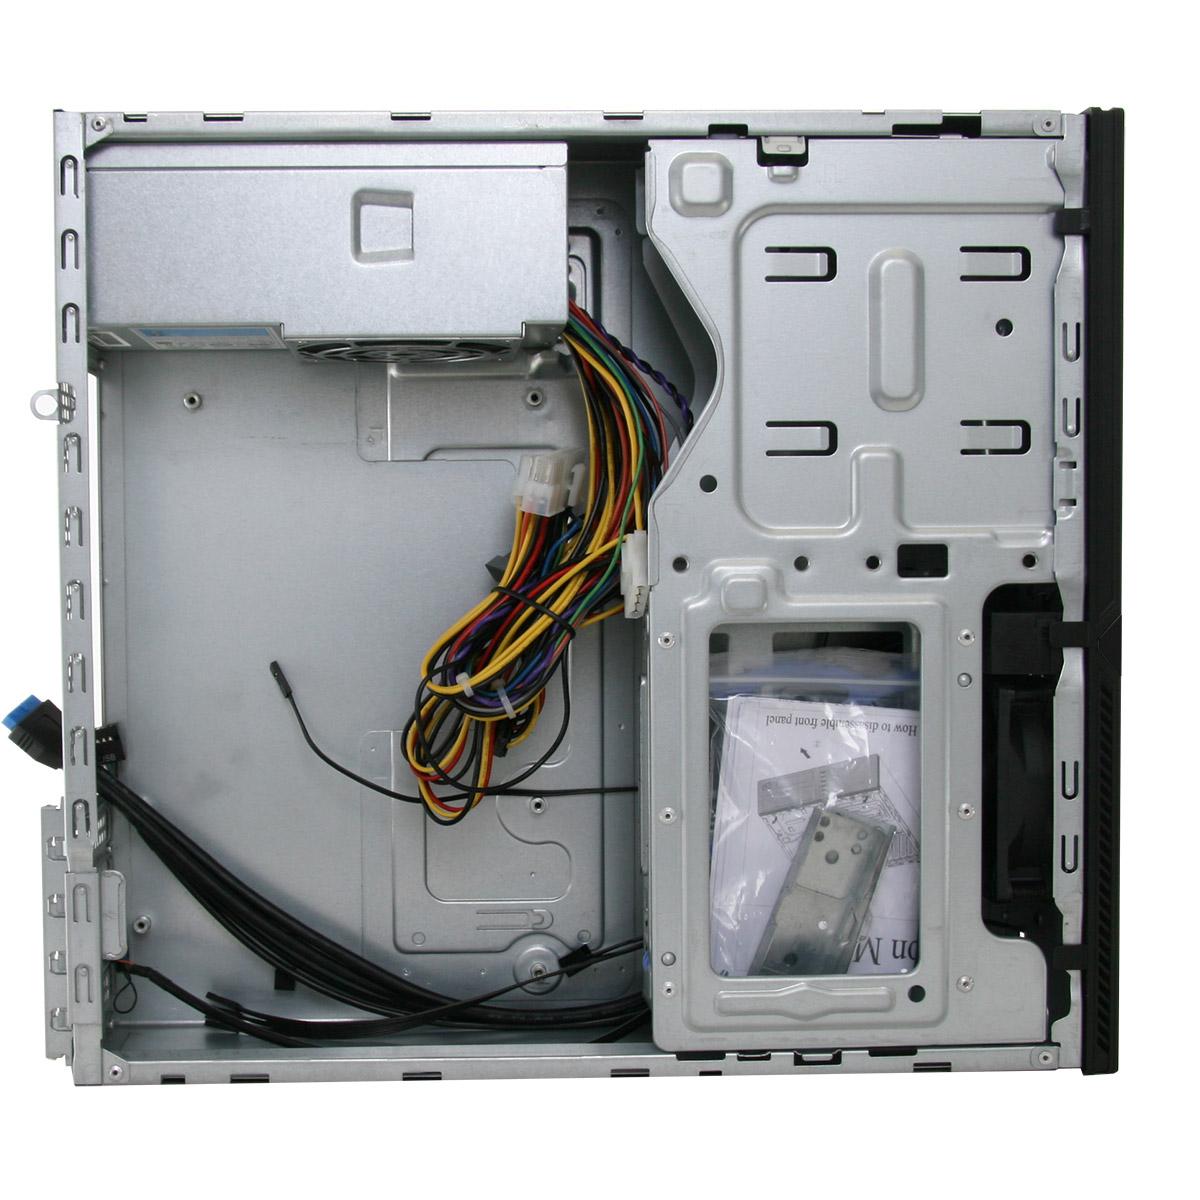 Cit S503 Micro Atx Desk Top Case 2 X Usb2 2 X Usb3 With